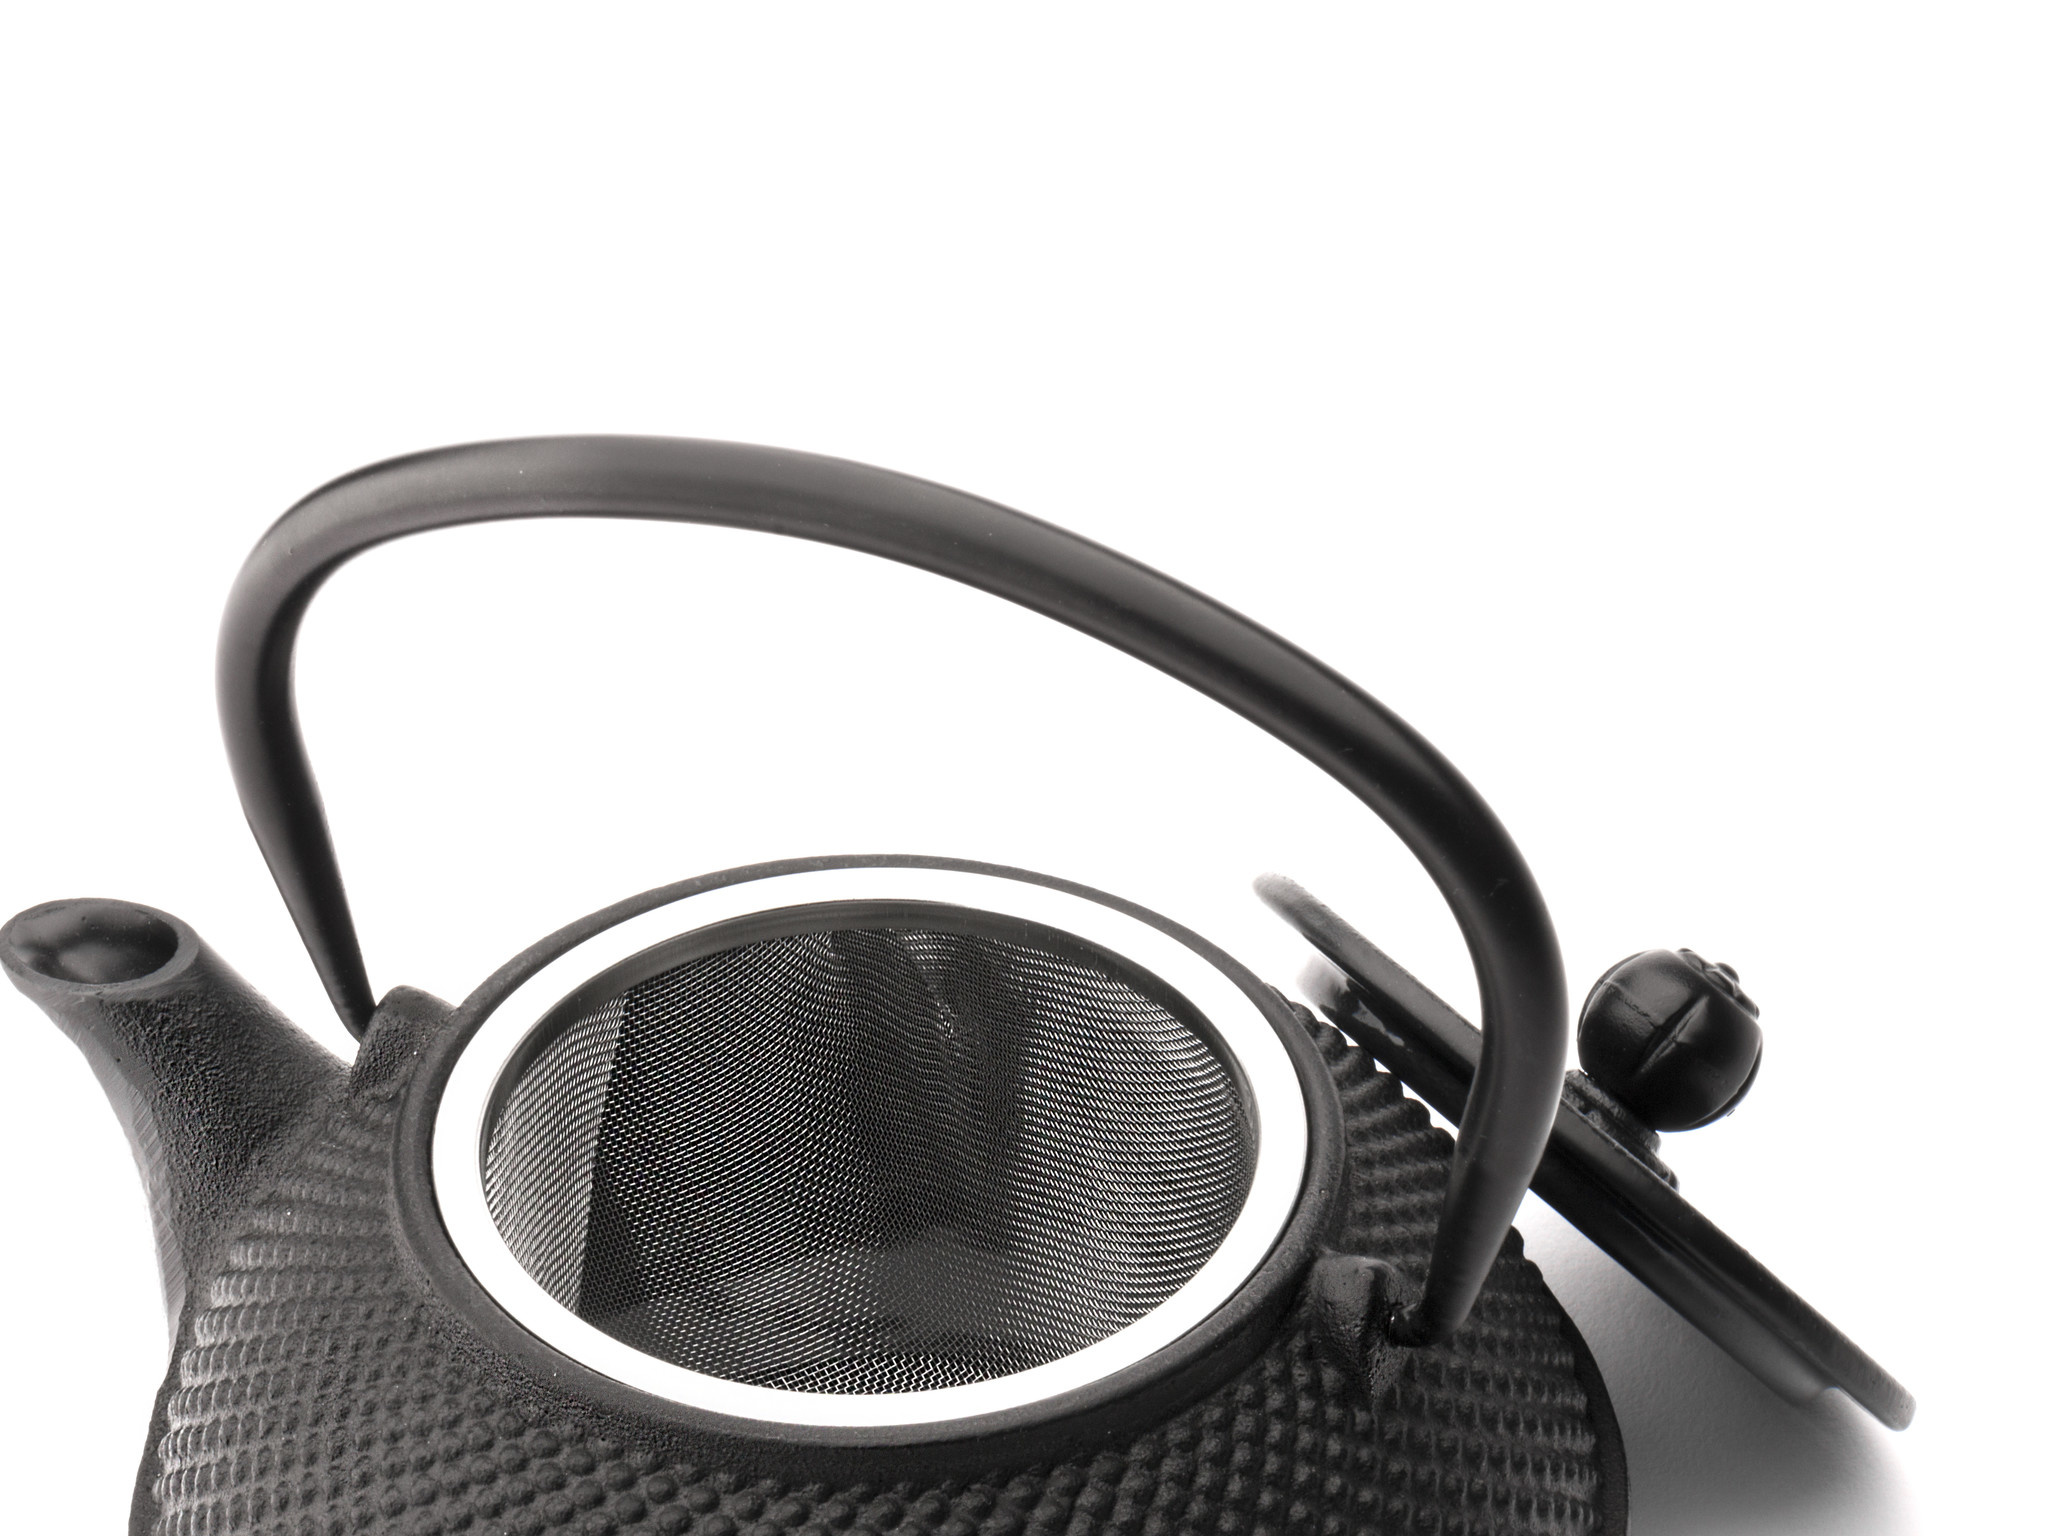 Bredemeijer Theepot Jang 0.8 L gietijzer zwart